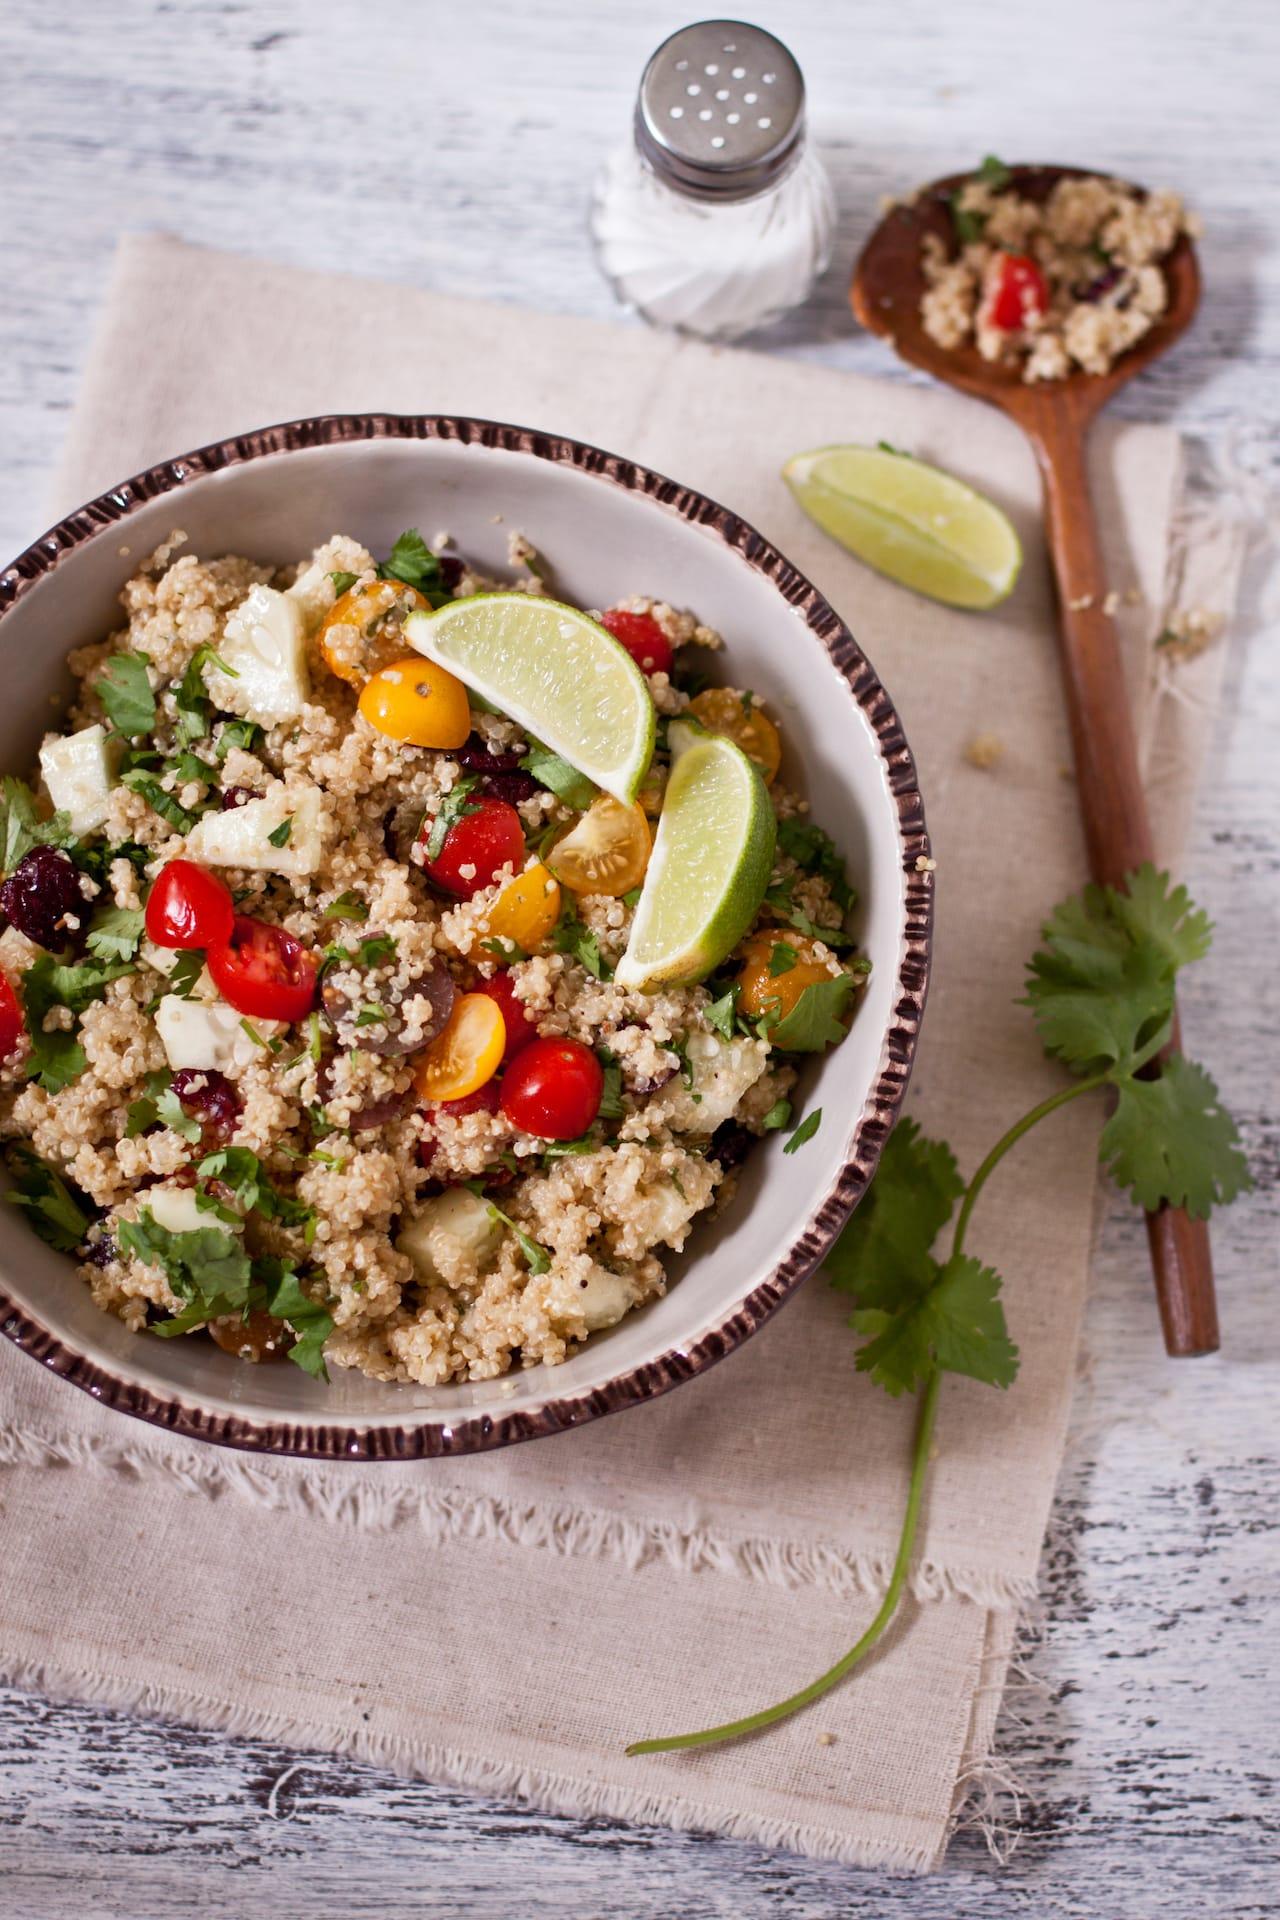 Quinoa Salad with Ricotta and Garam Masala Dressing 1